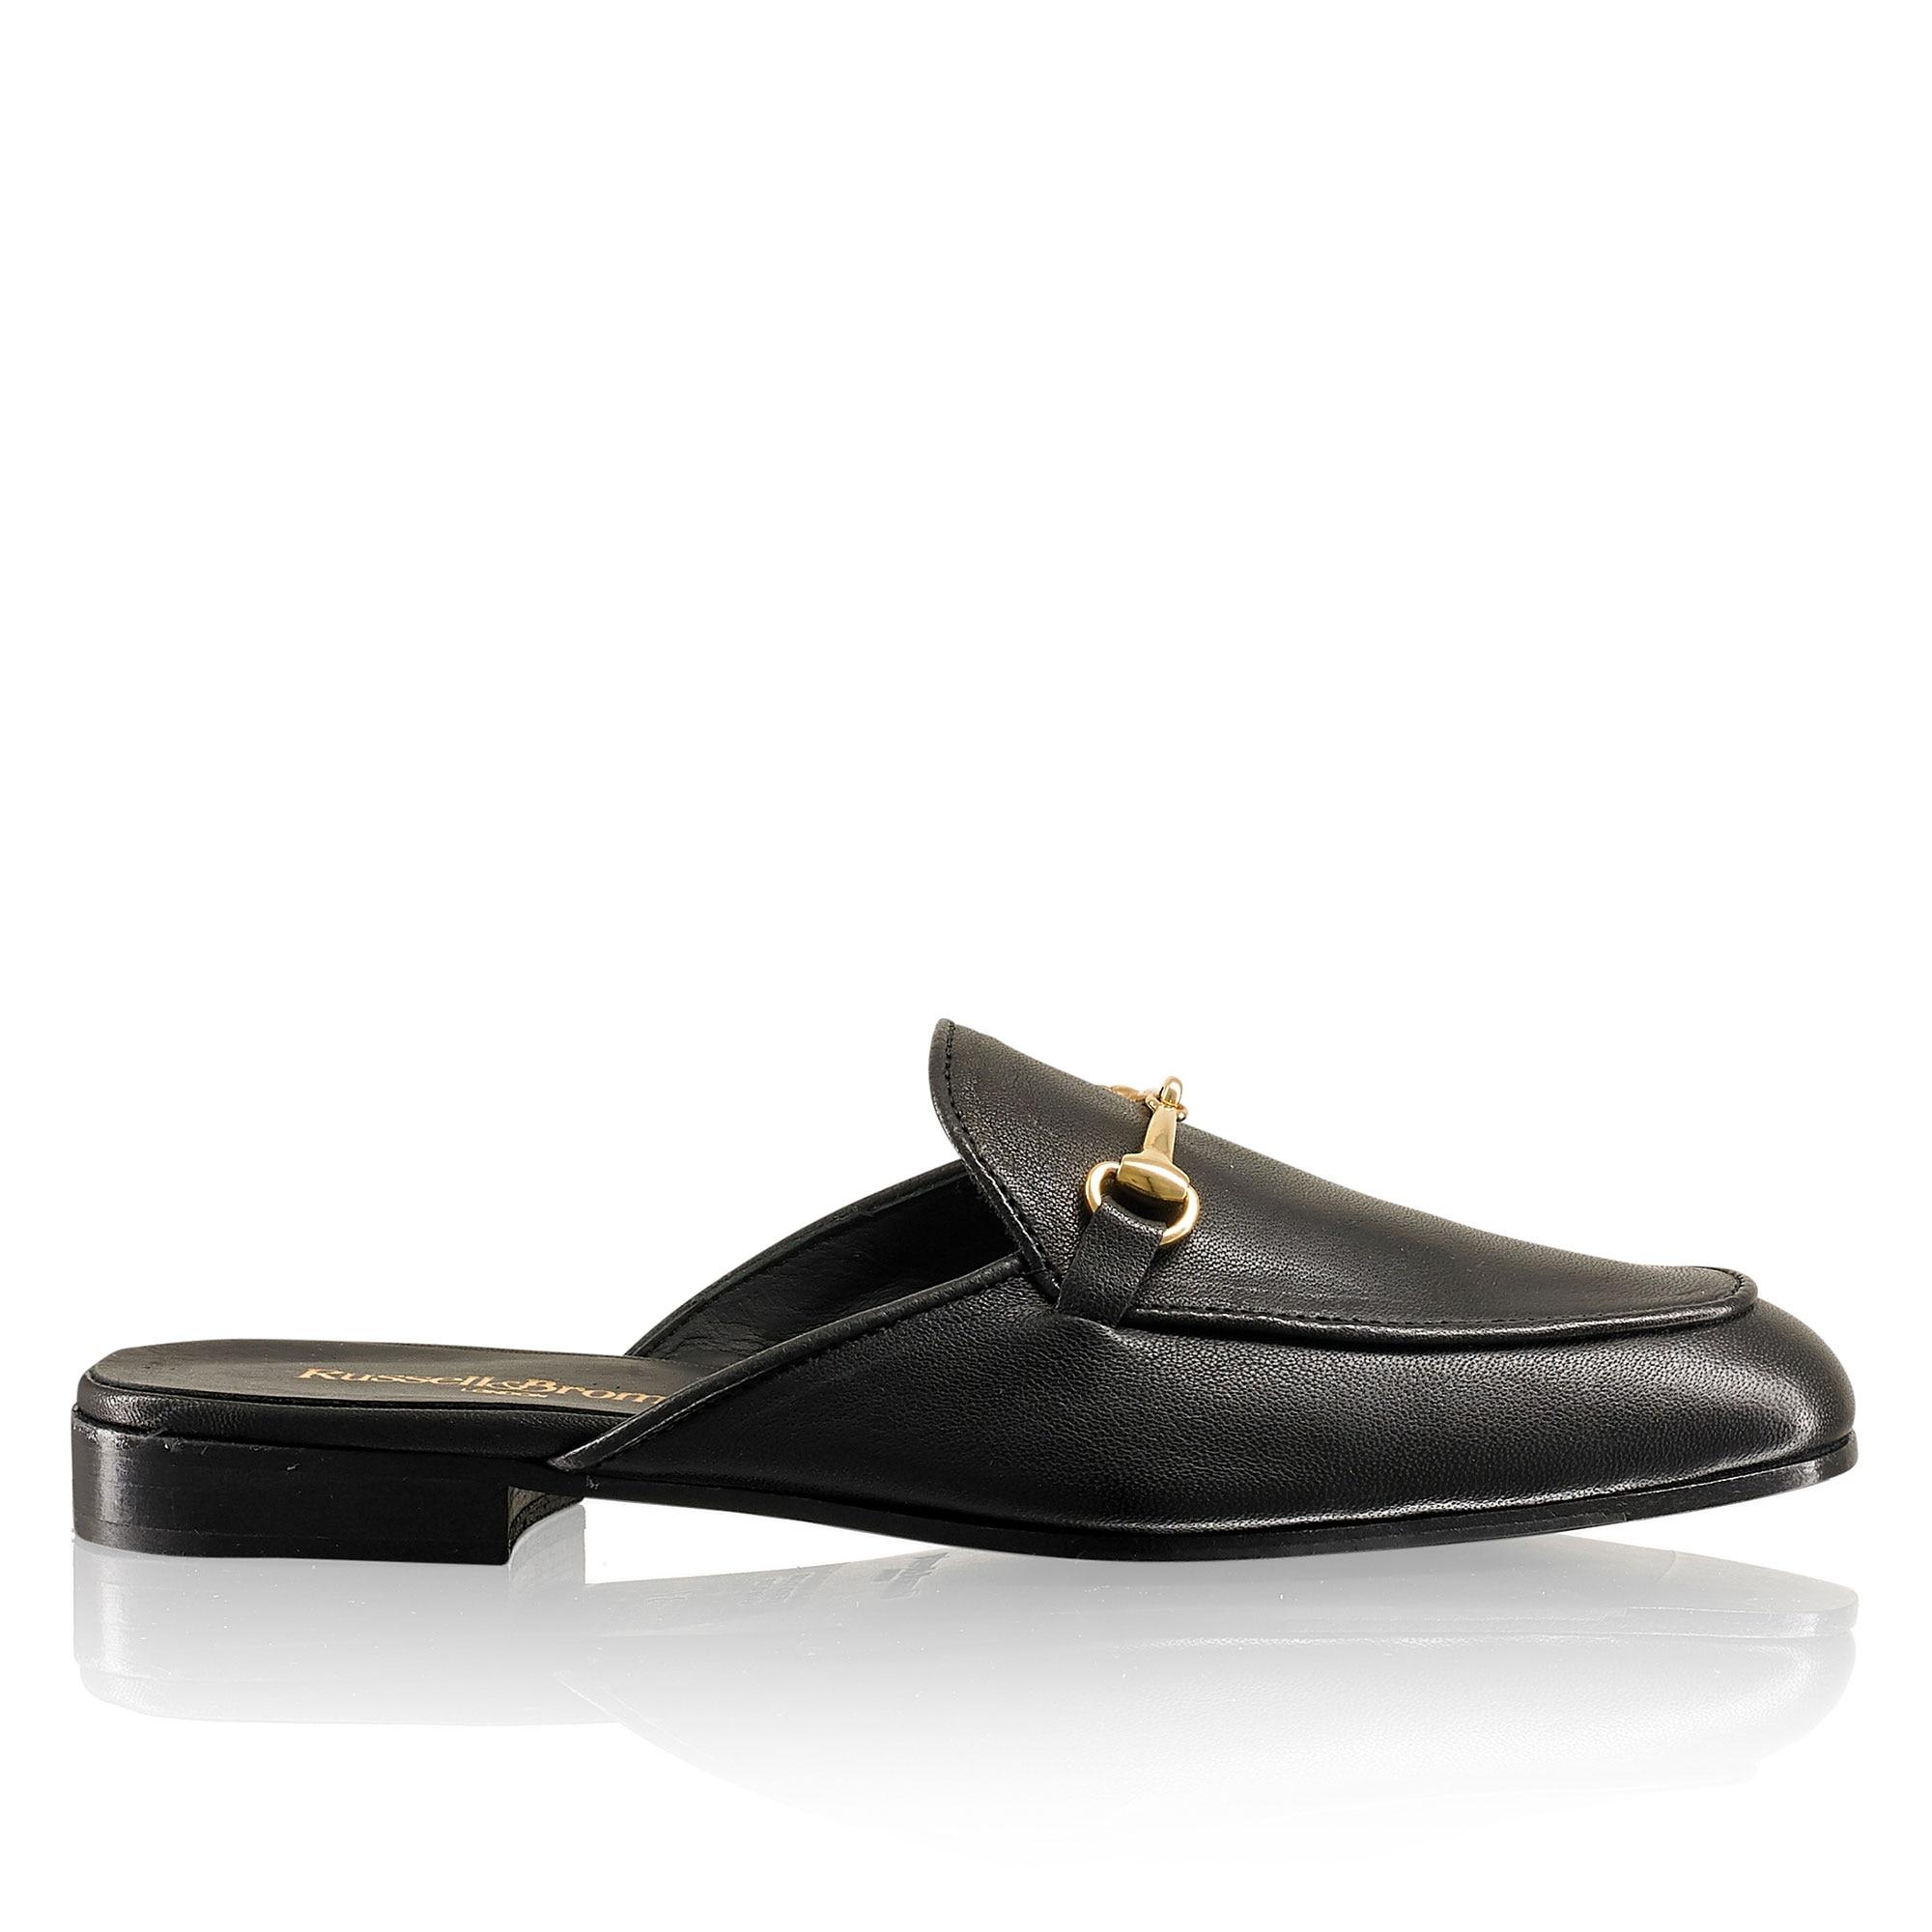 LOAFERMULE Backless Loafer in Black